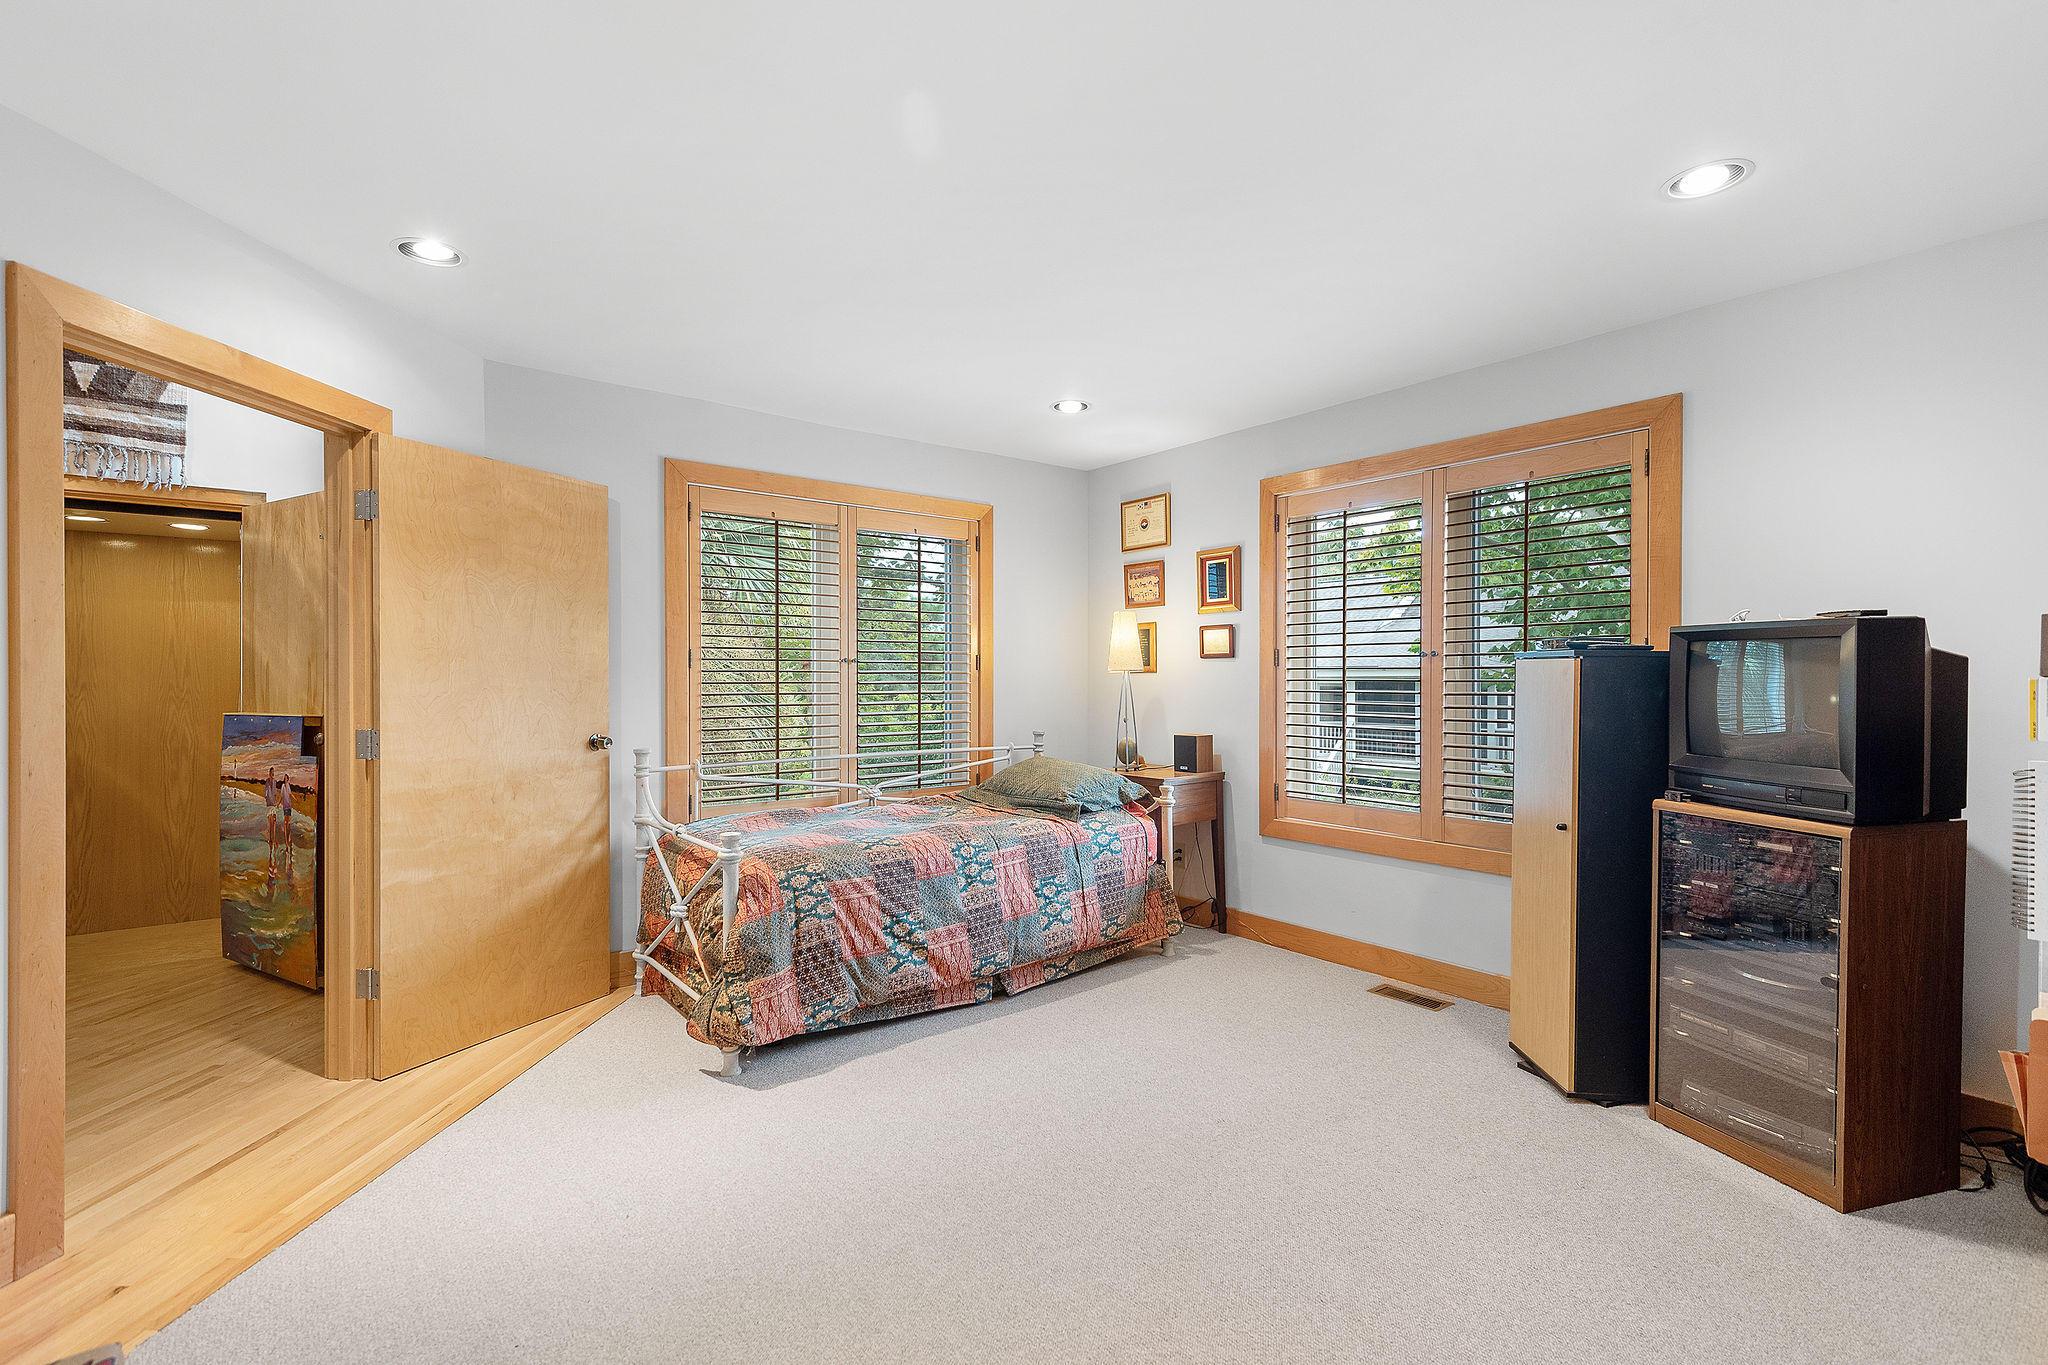 Home Farm Homes For Sale - 1564 Home Farm, Mount Pleasant, SC - 5